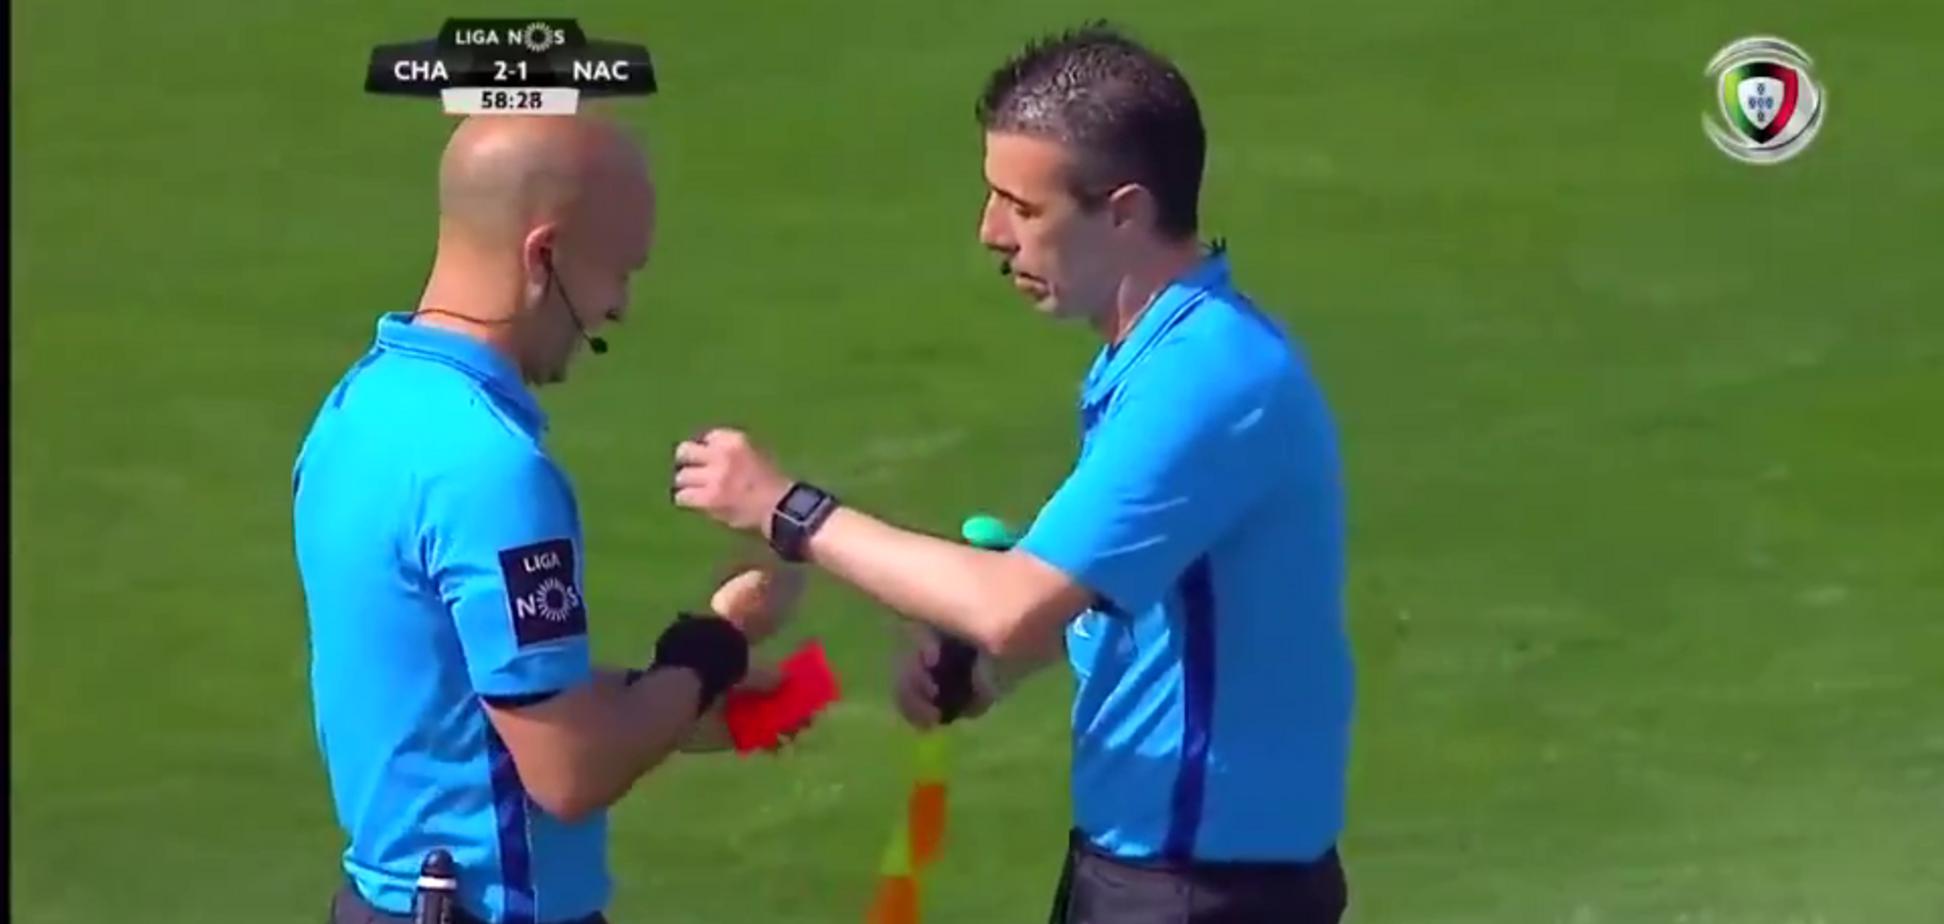 Арбитр остановил матч, сбежав в туалет, и получил красную карточку